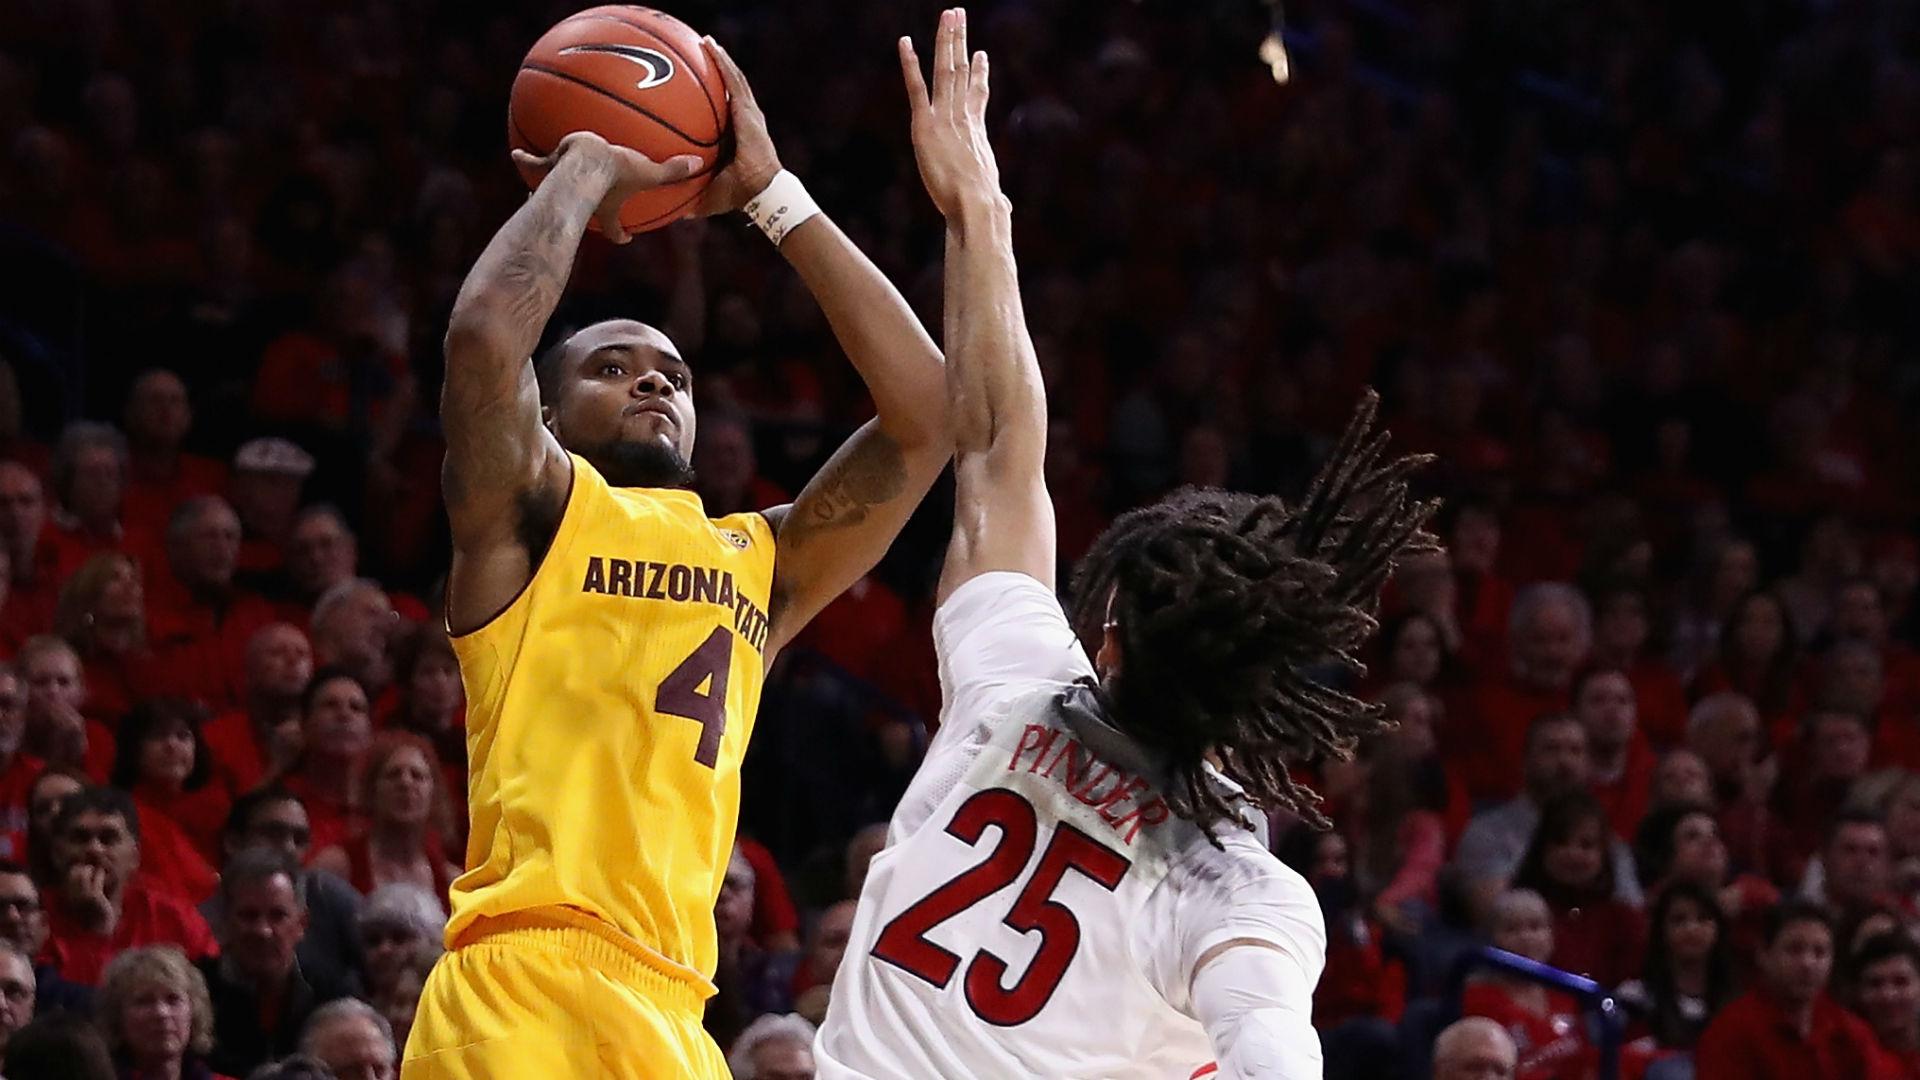 ASU player flips off the Arizona student section